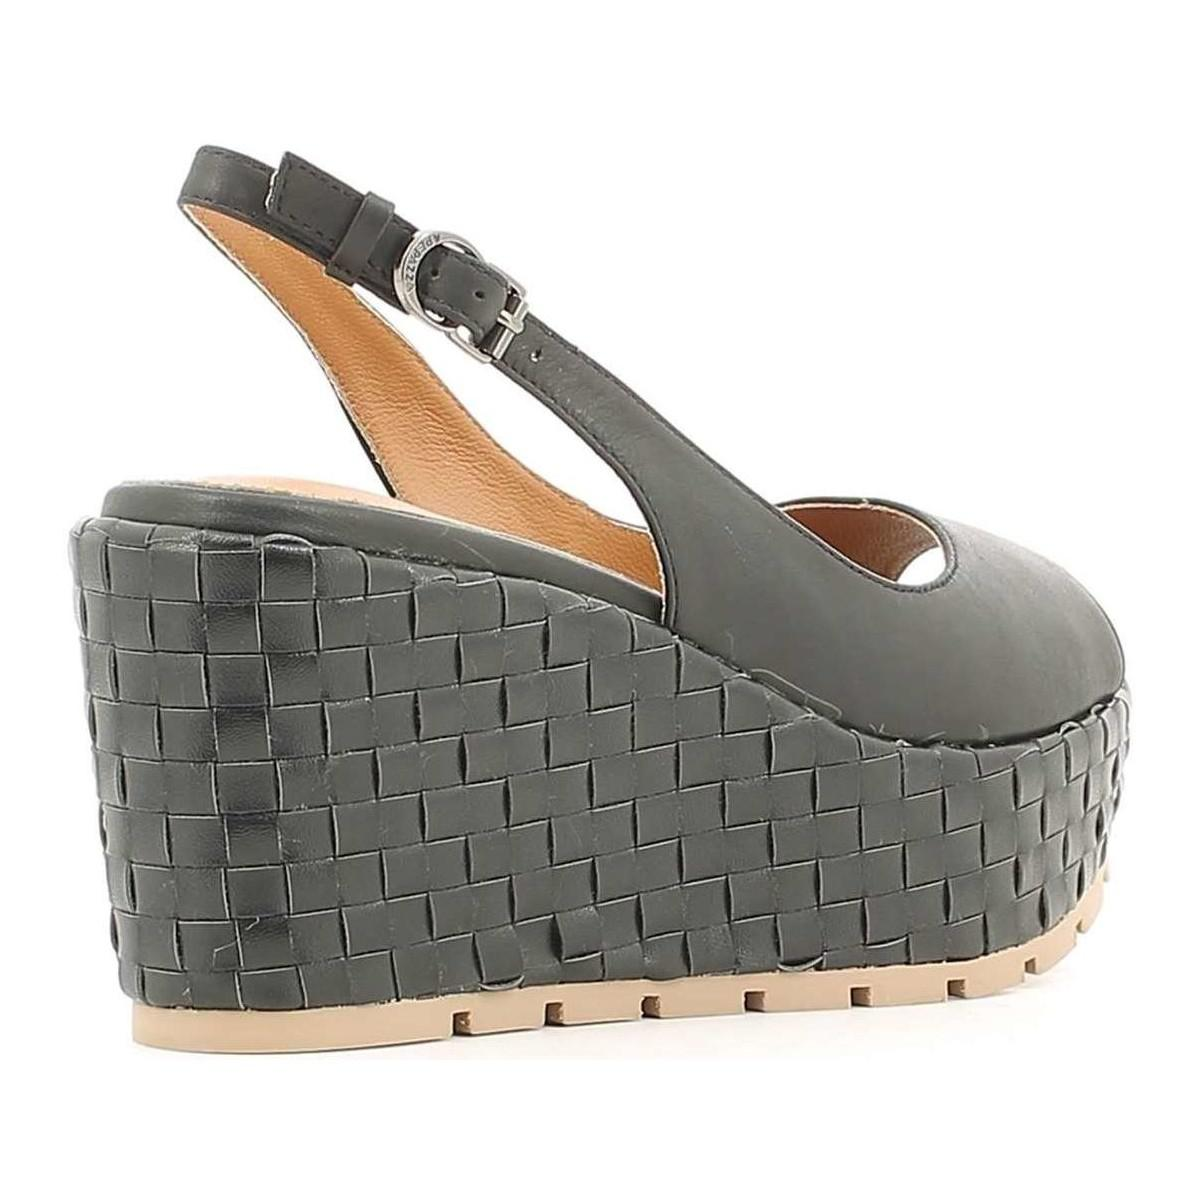 In Wedge Sandals Black Women Vty01 Apepazza Nnk8ox0wp Women's Ajq3Rc5L4